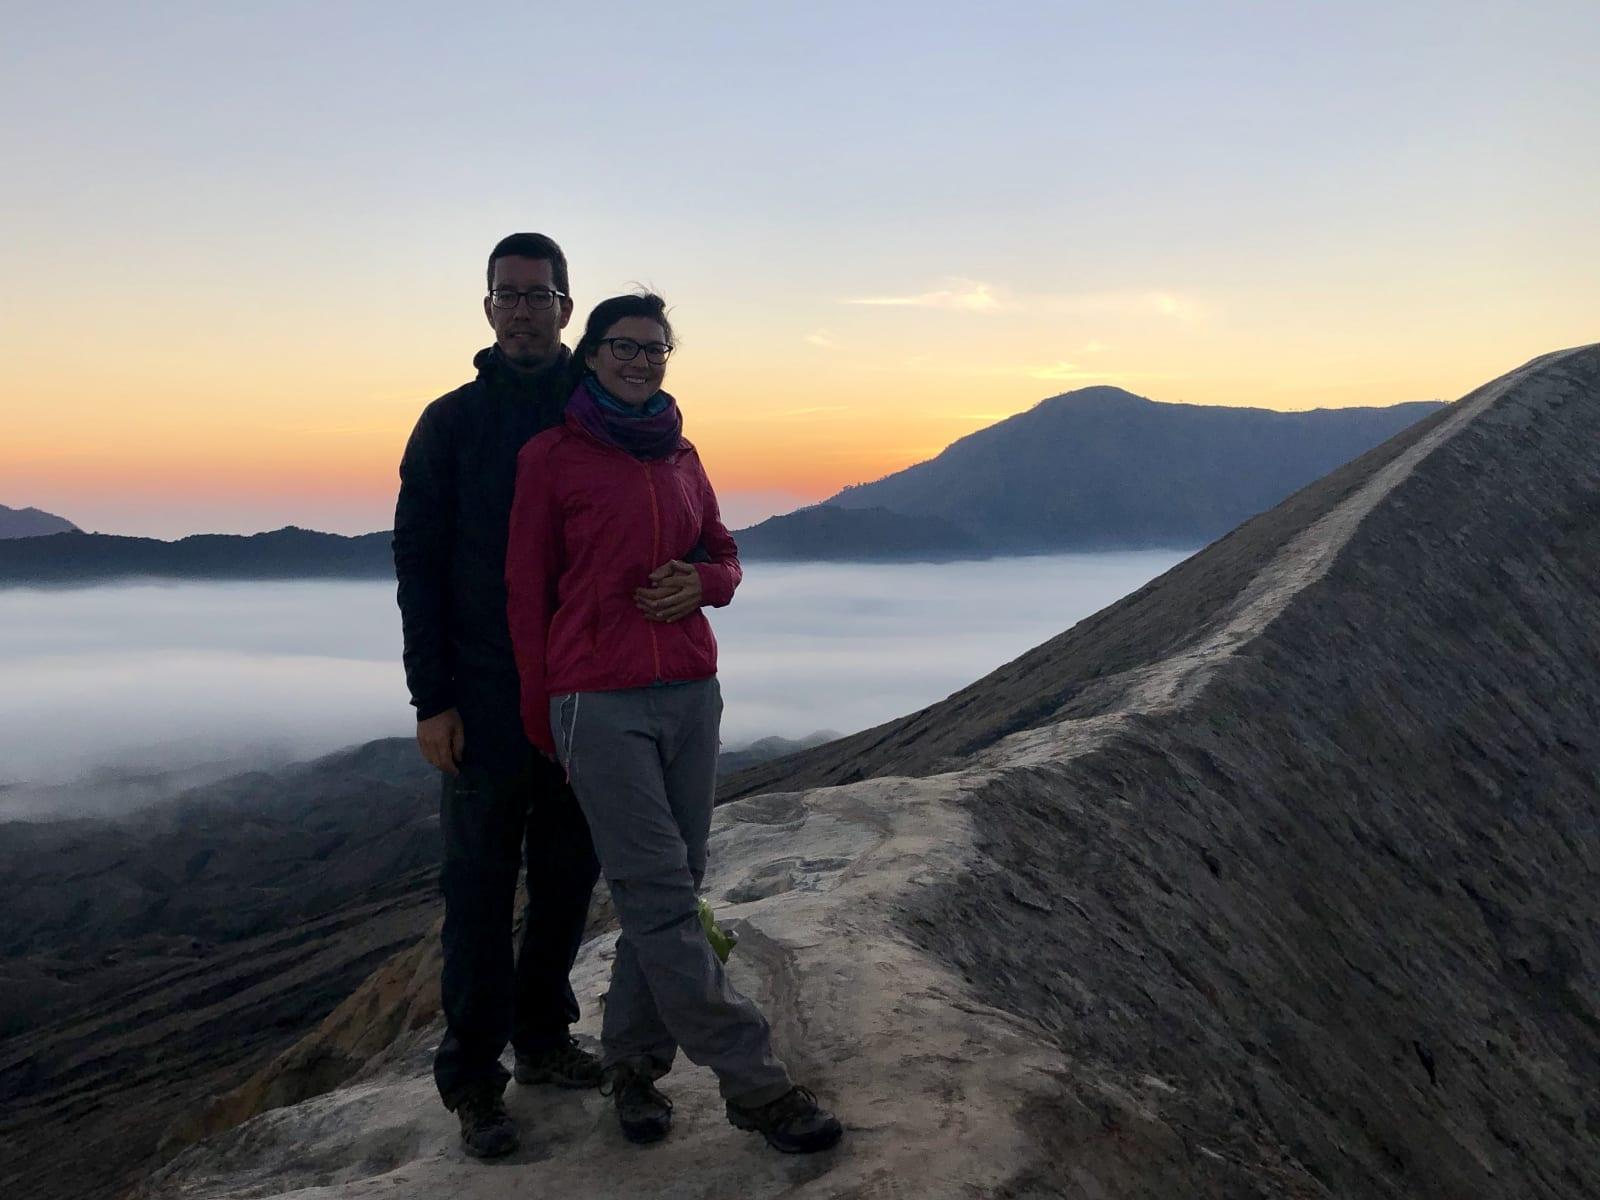 Východ slunce na sopce Bromo, Jáva, Indonésie